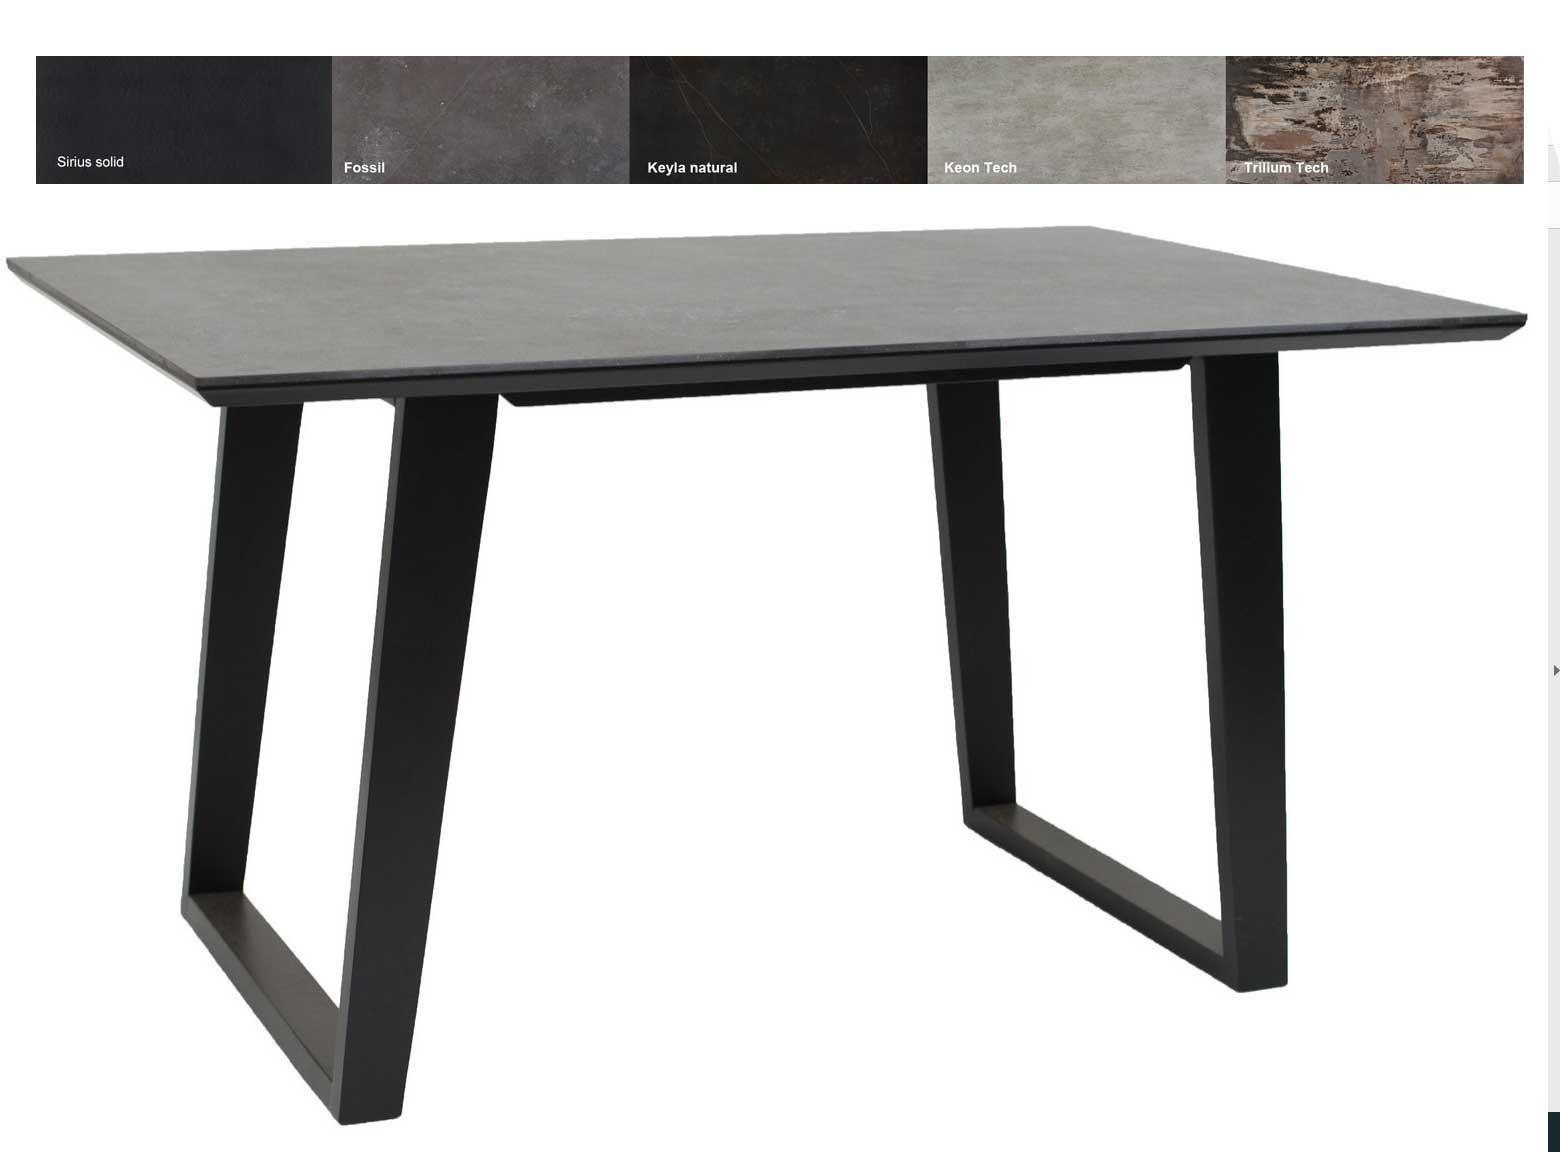 Standard Furniture moderne Essgruppe mit Dekton Fossil